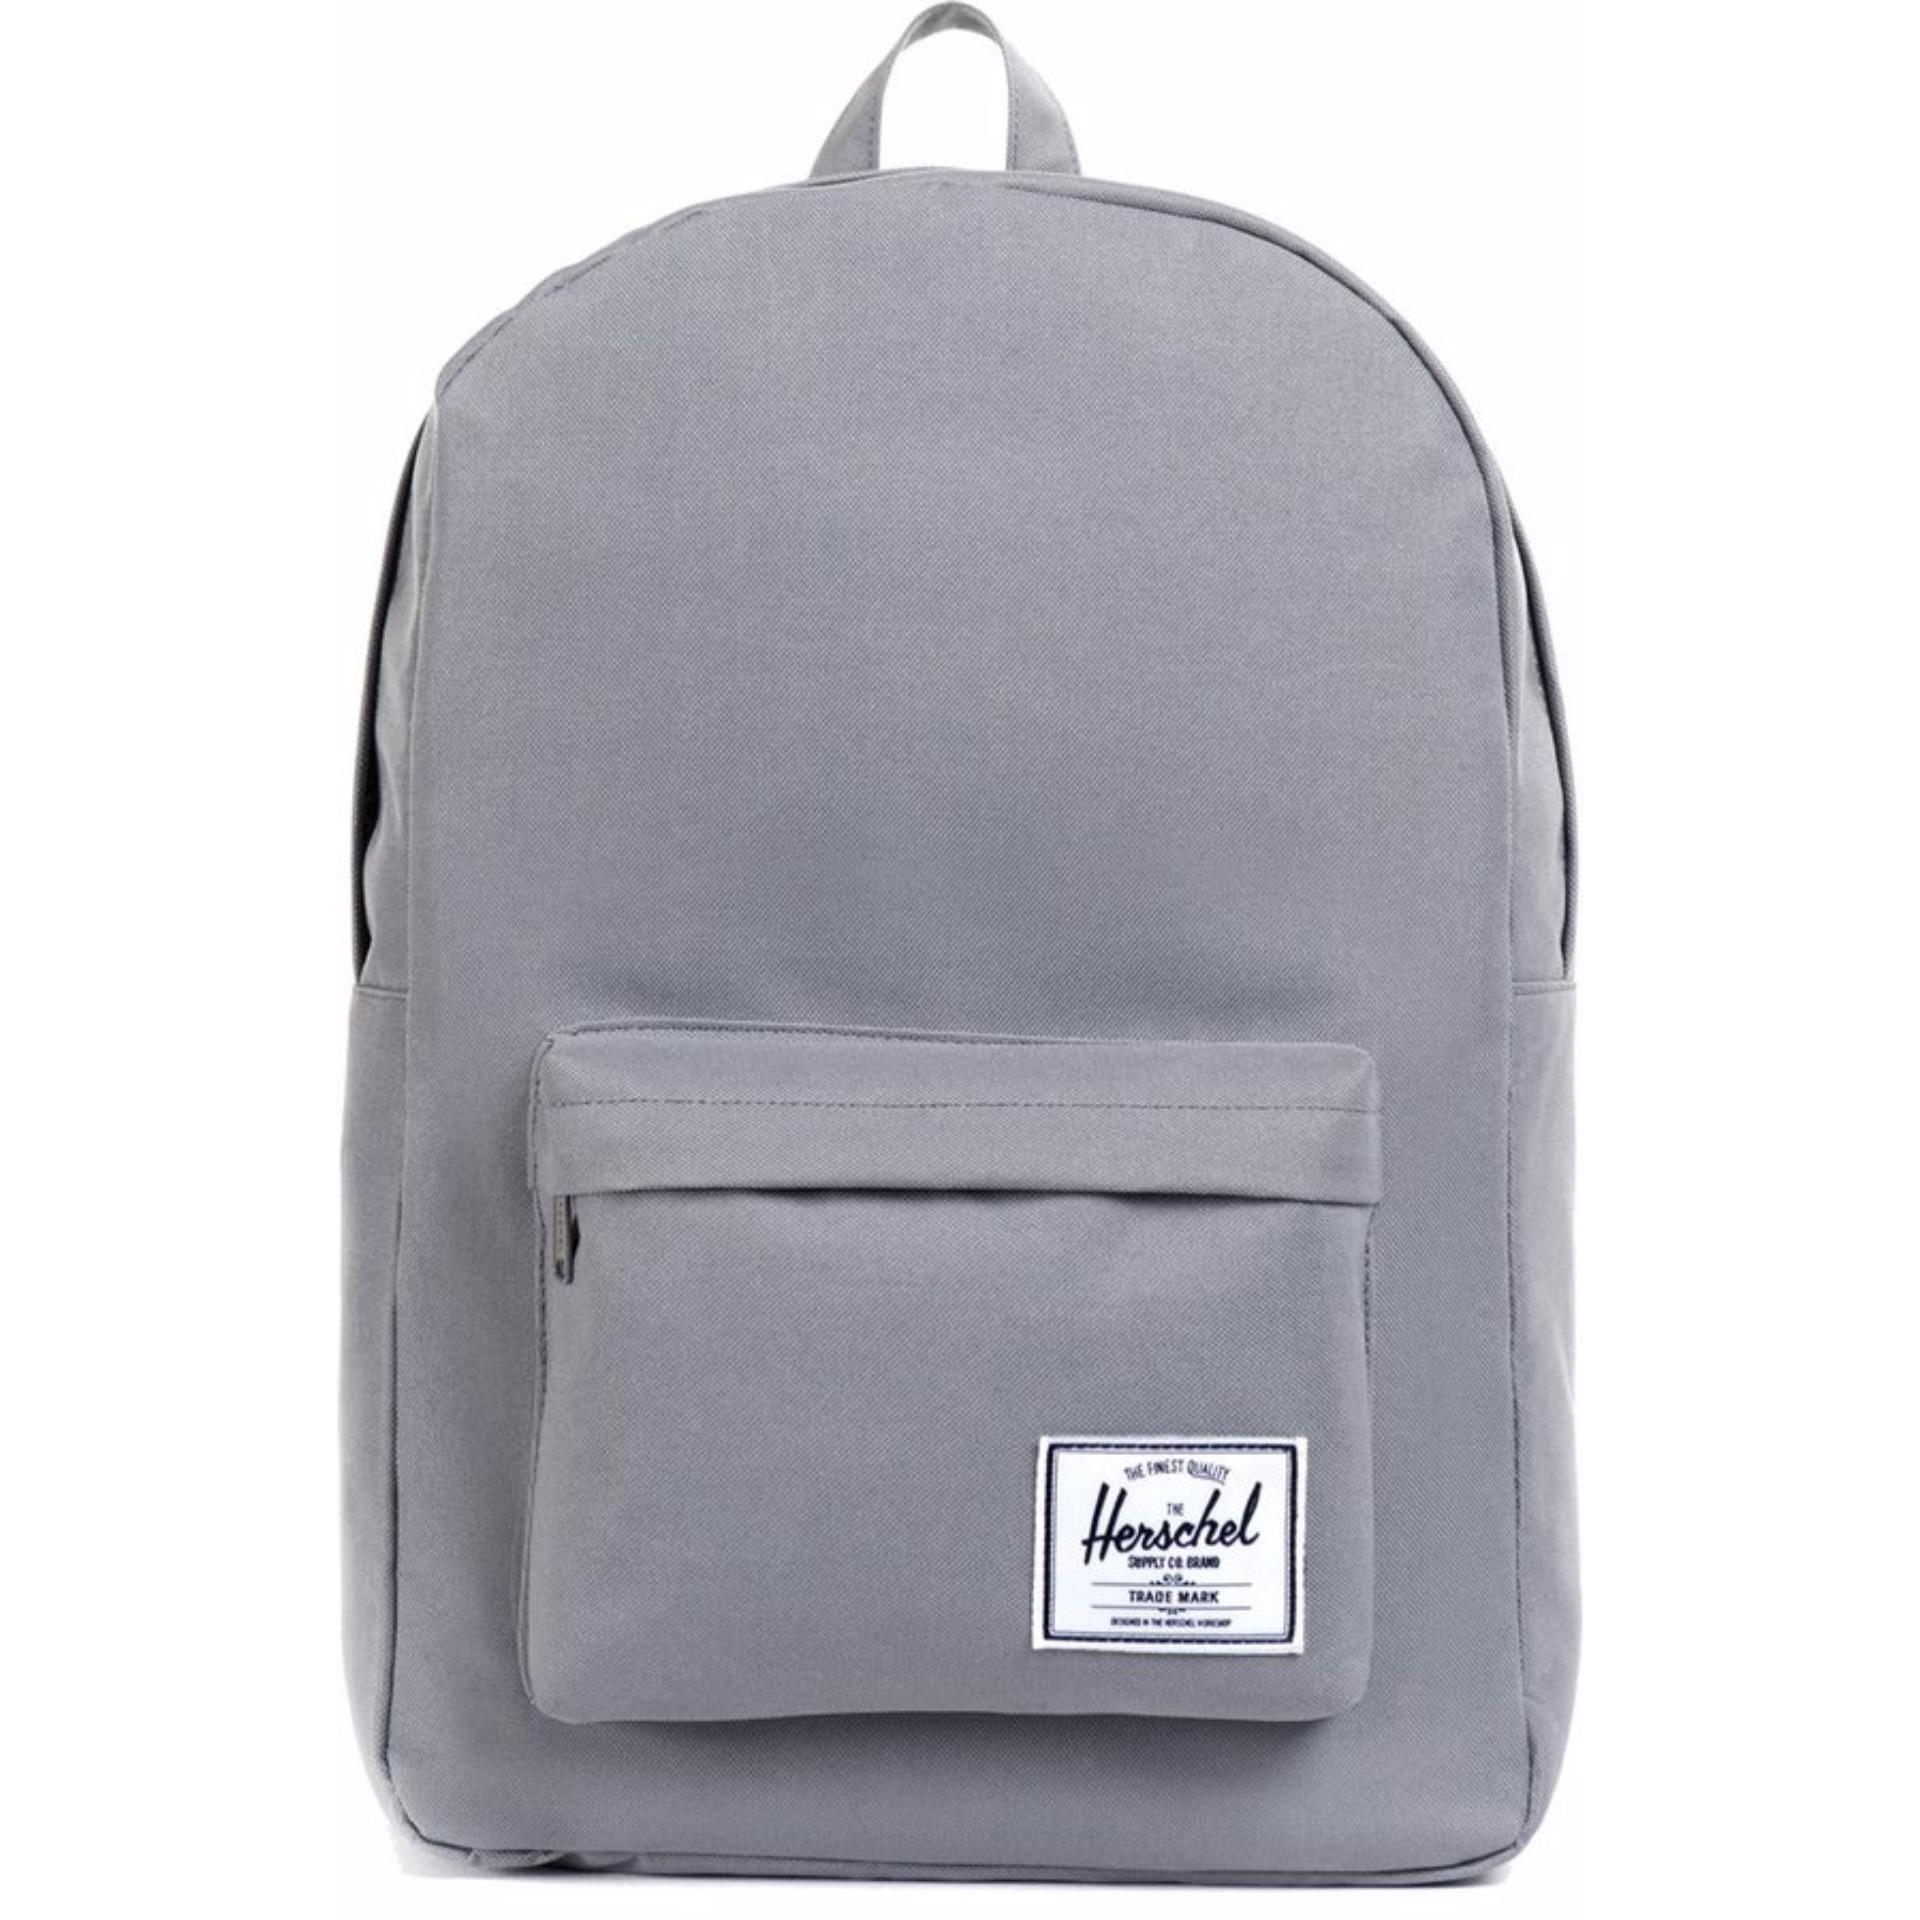 1356300667a Herschel Supply Co. Classic 22L Grey Singapore